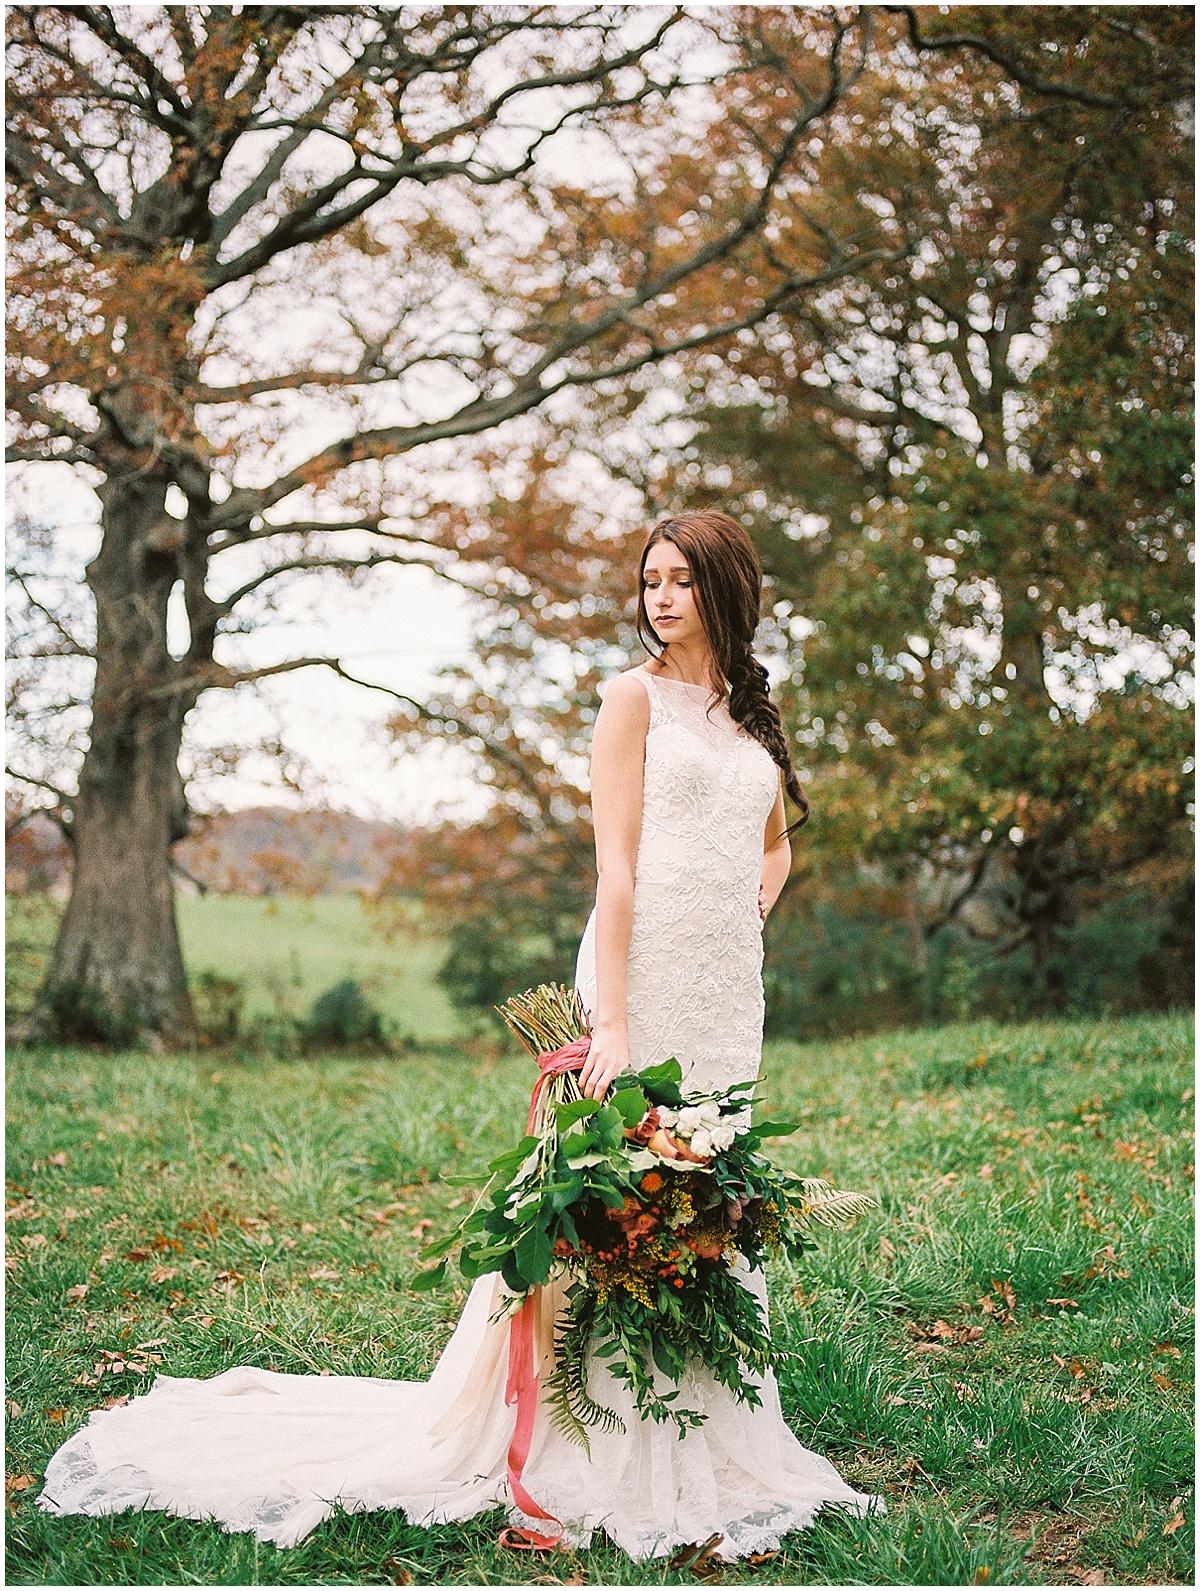 Abigail_Malone_Fall_Wedding_Knoxville_Film_Portra_400_Kodak_Mountain_Views_Abby_Elizabeth-53.jpg